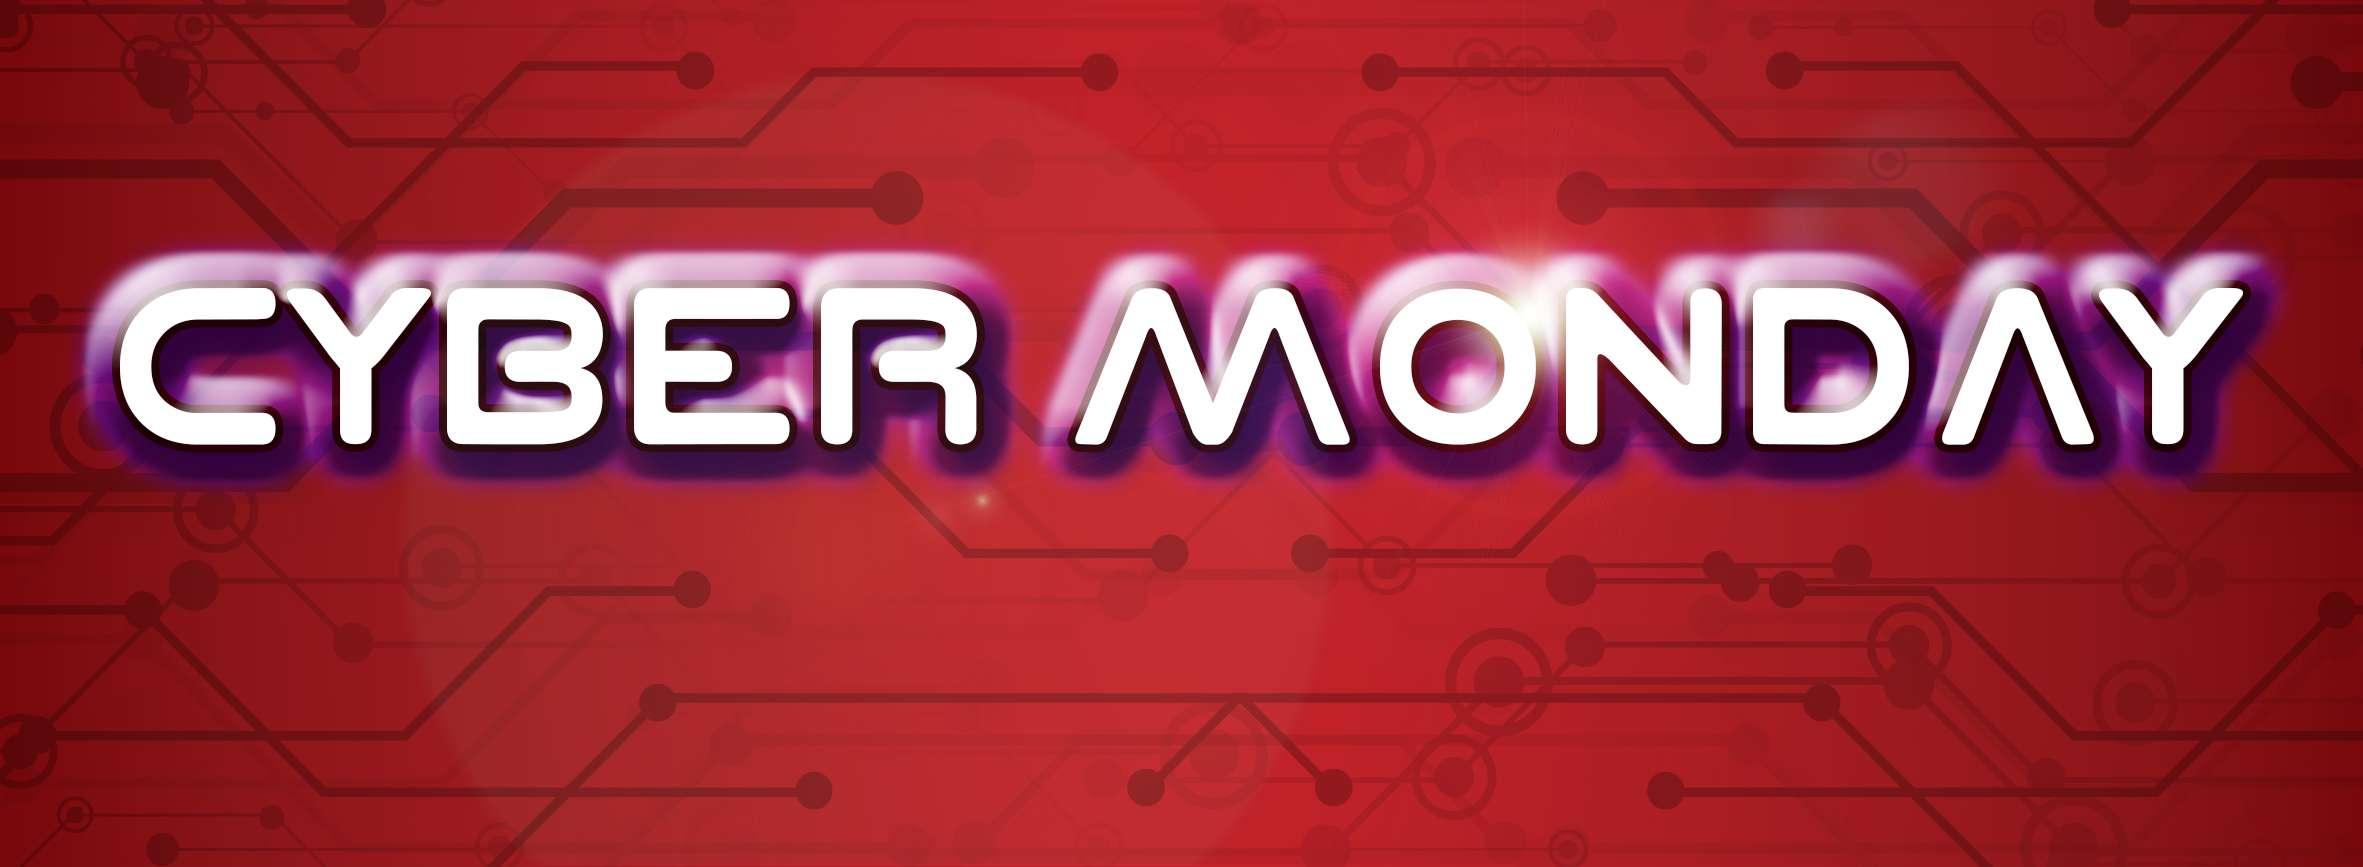 Cyber Monday Wishes Unique Image